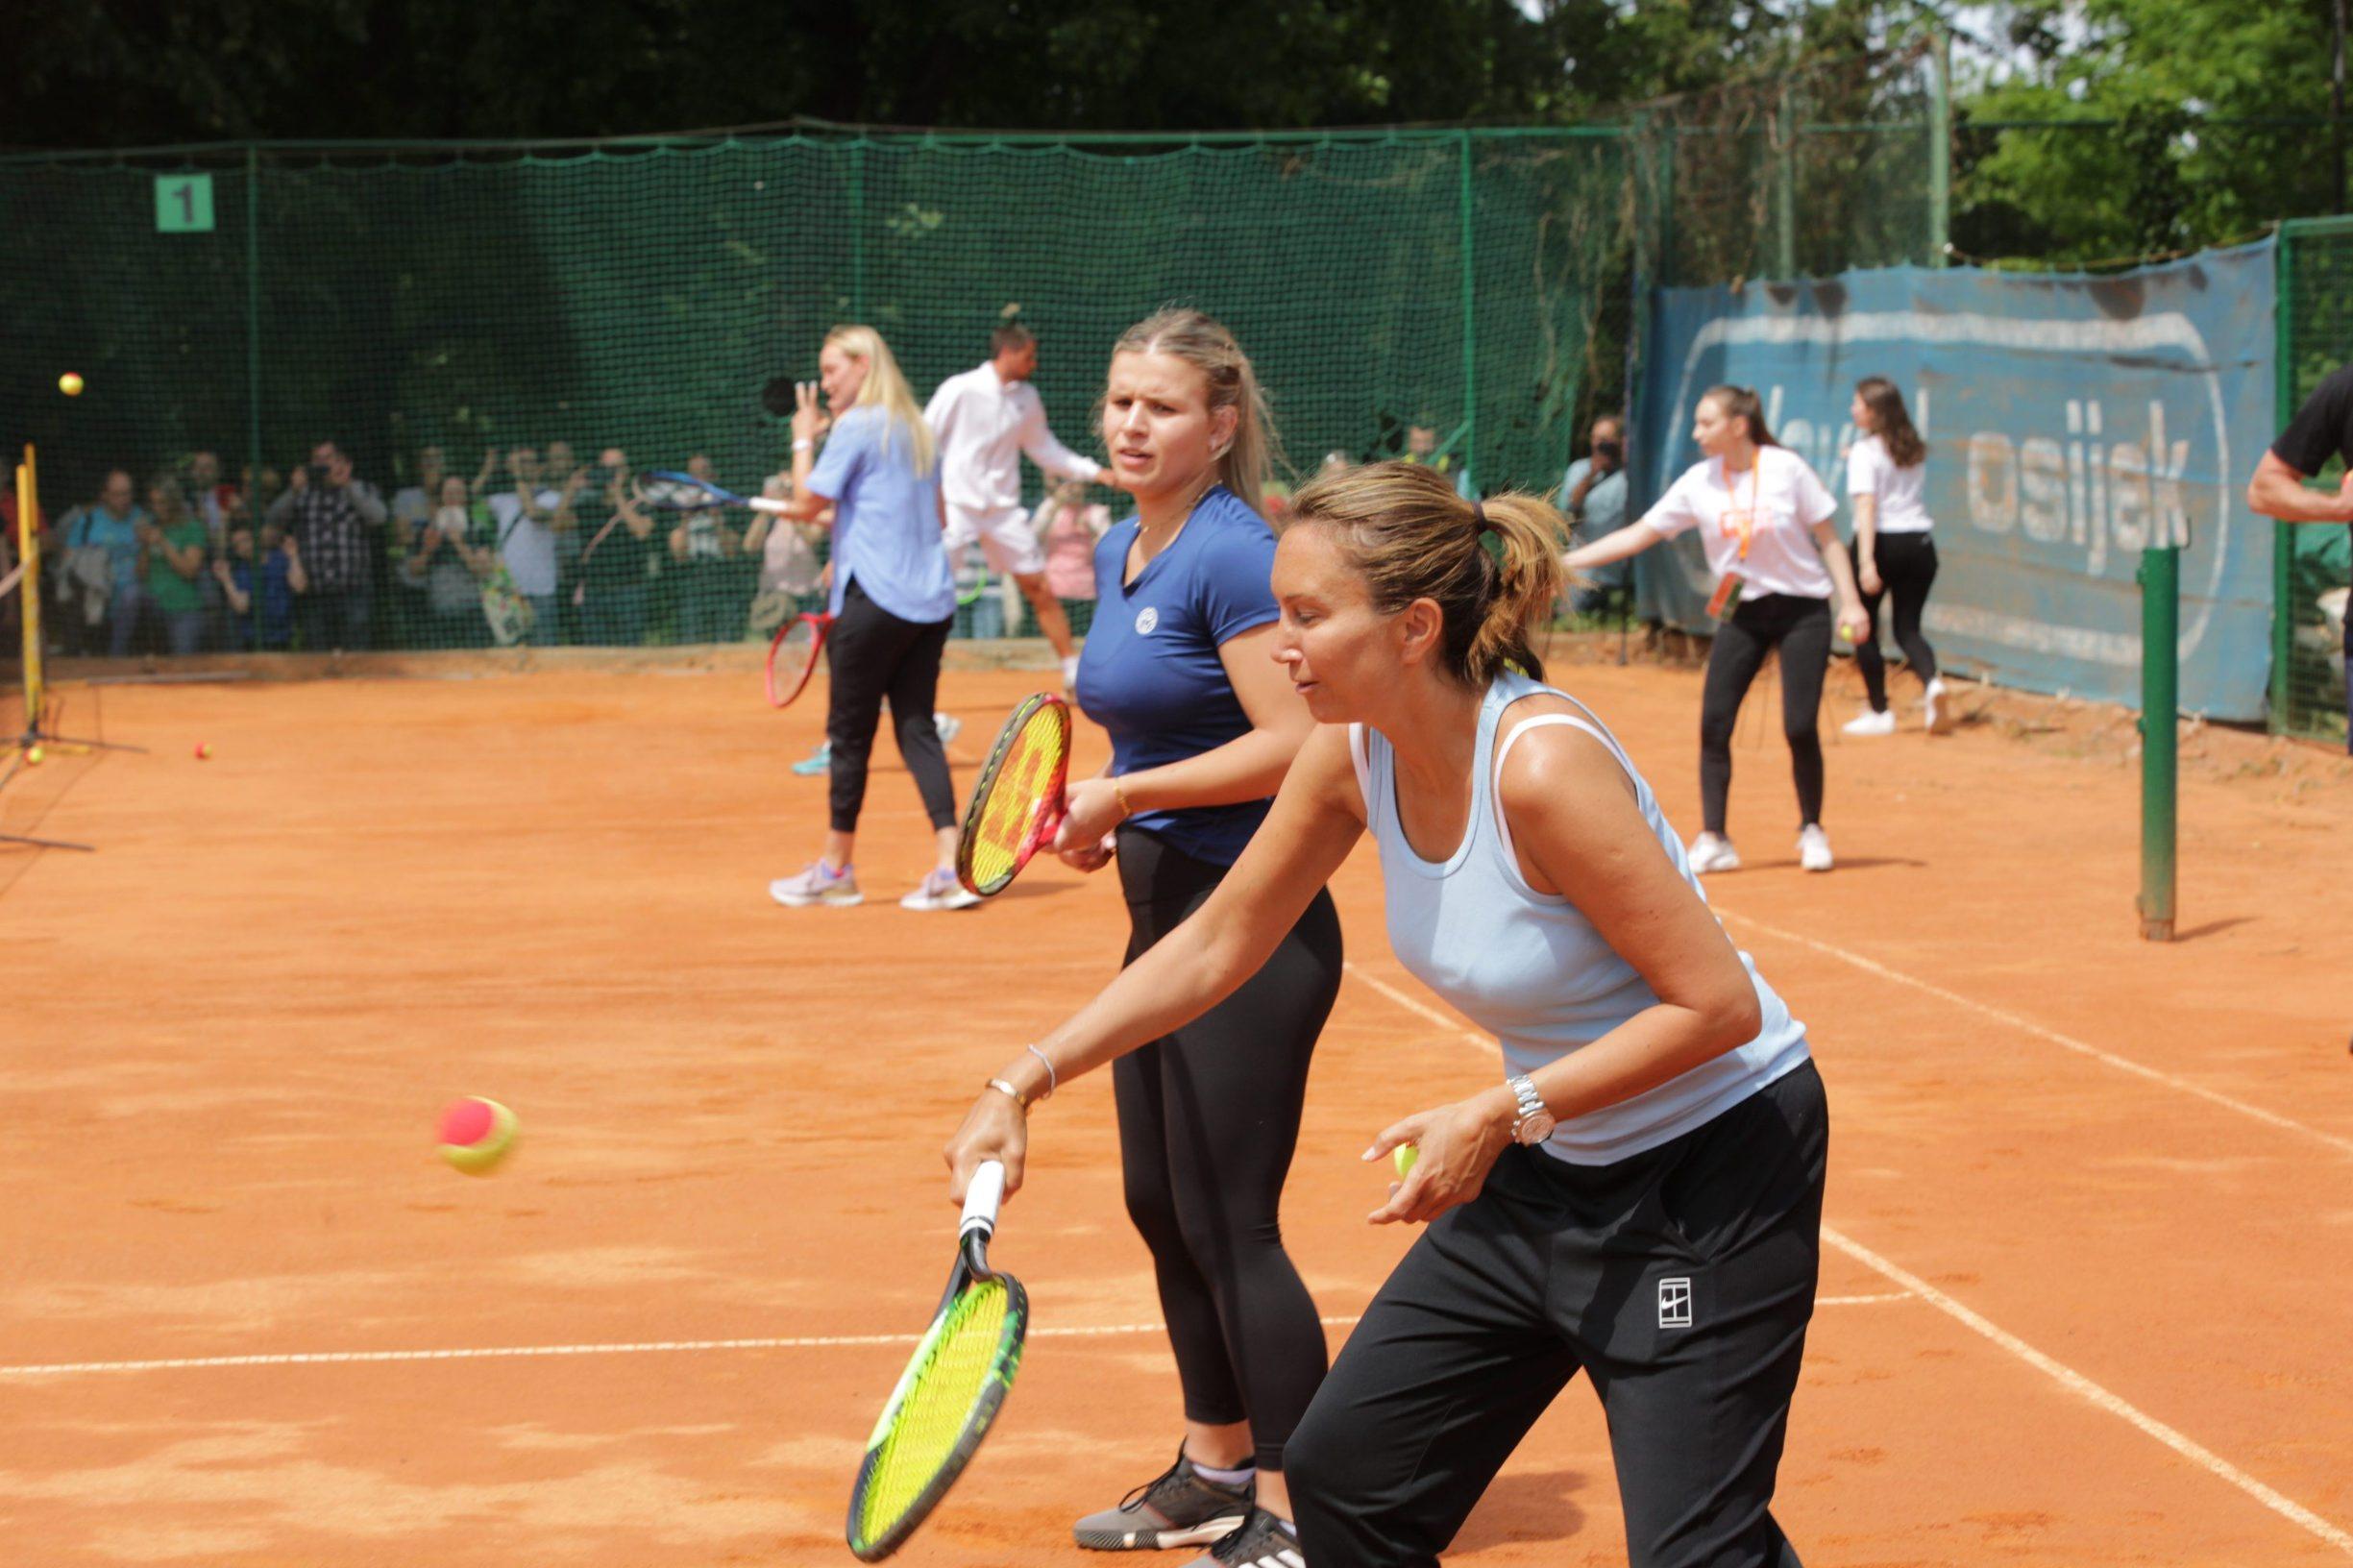 Osijek, 040620. Tenis. Humanitarni turnir Hrvatski premier Tenis. Na fotografiji: okupljanje tenisaca pred pocetak turnira, Iva Majoli, Goran Ivanisevic. Foto: Vlado Kos / CROPIX